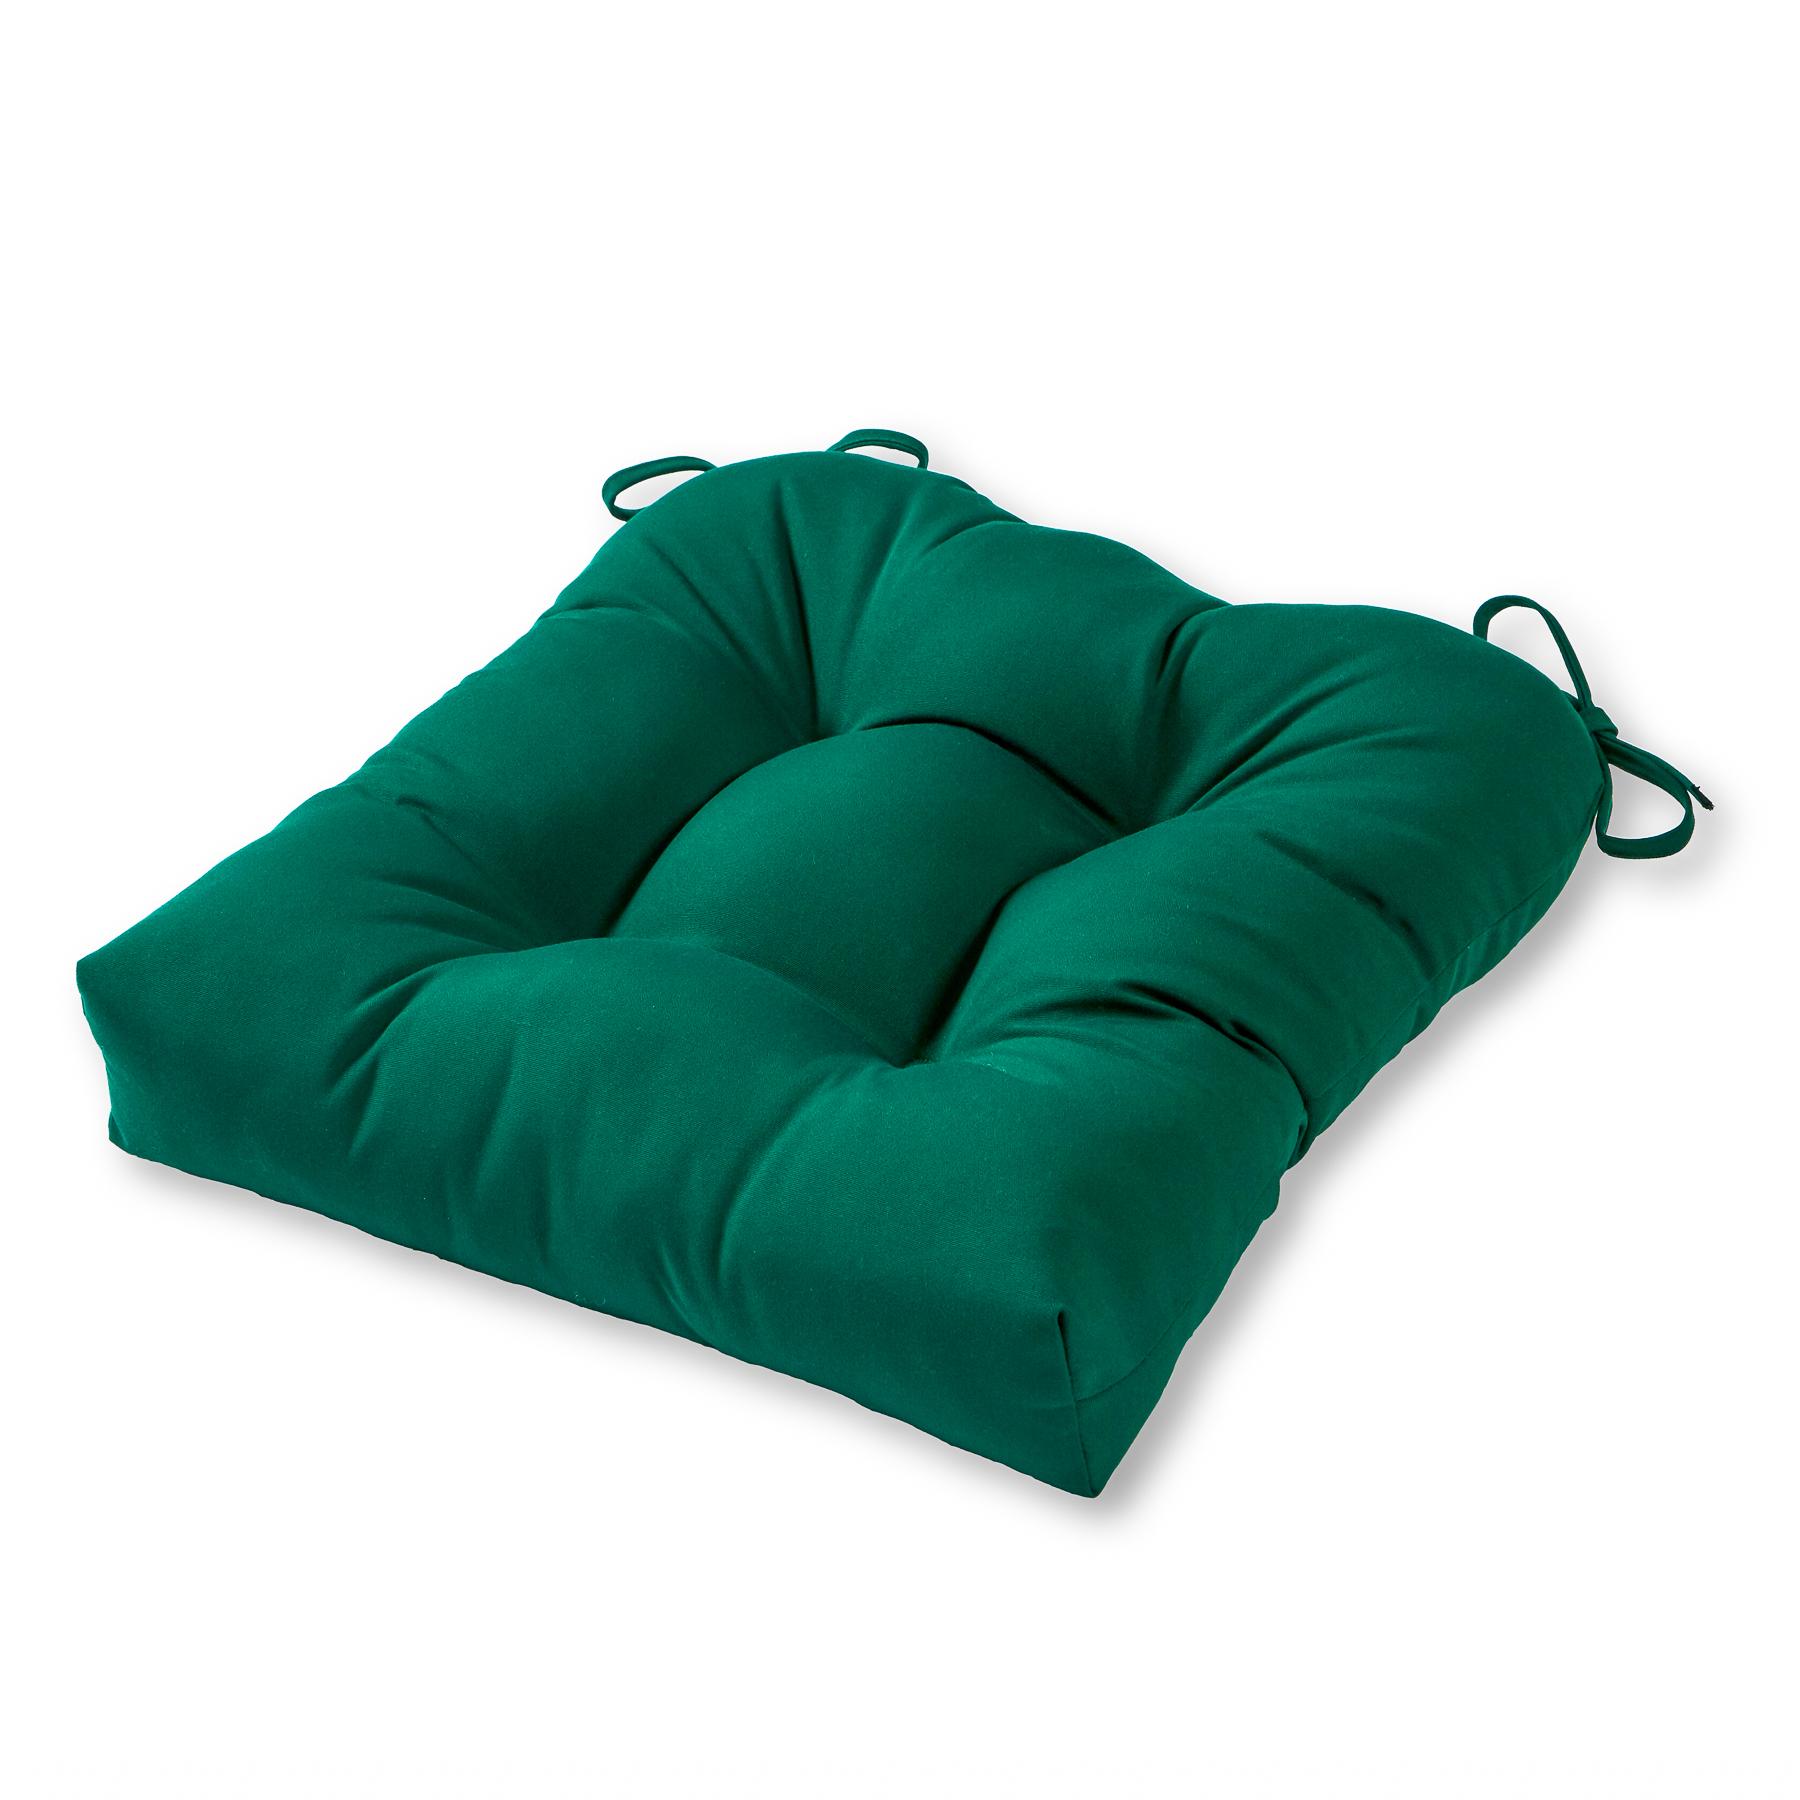 sunbrella chair cushion outdoor swing bunnings greendale home fashions 20